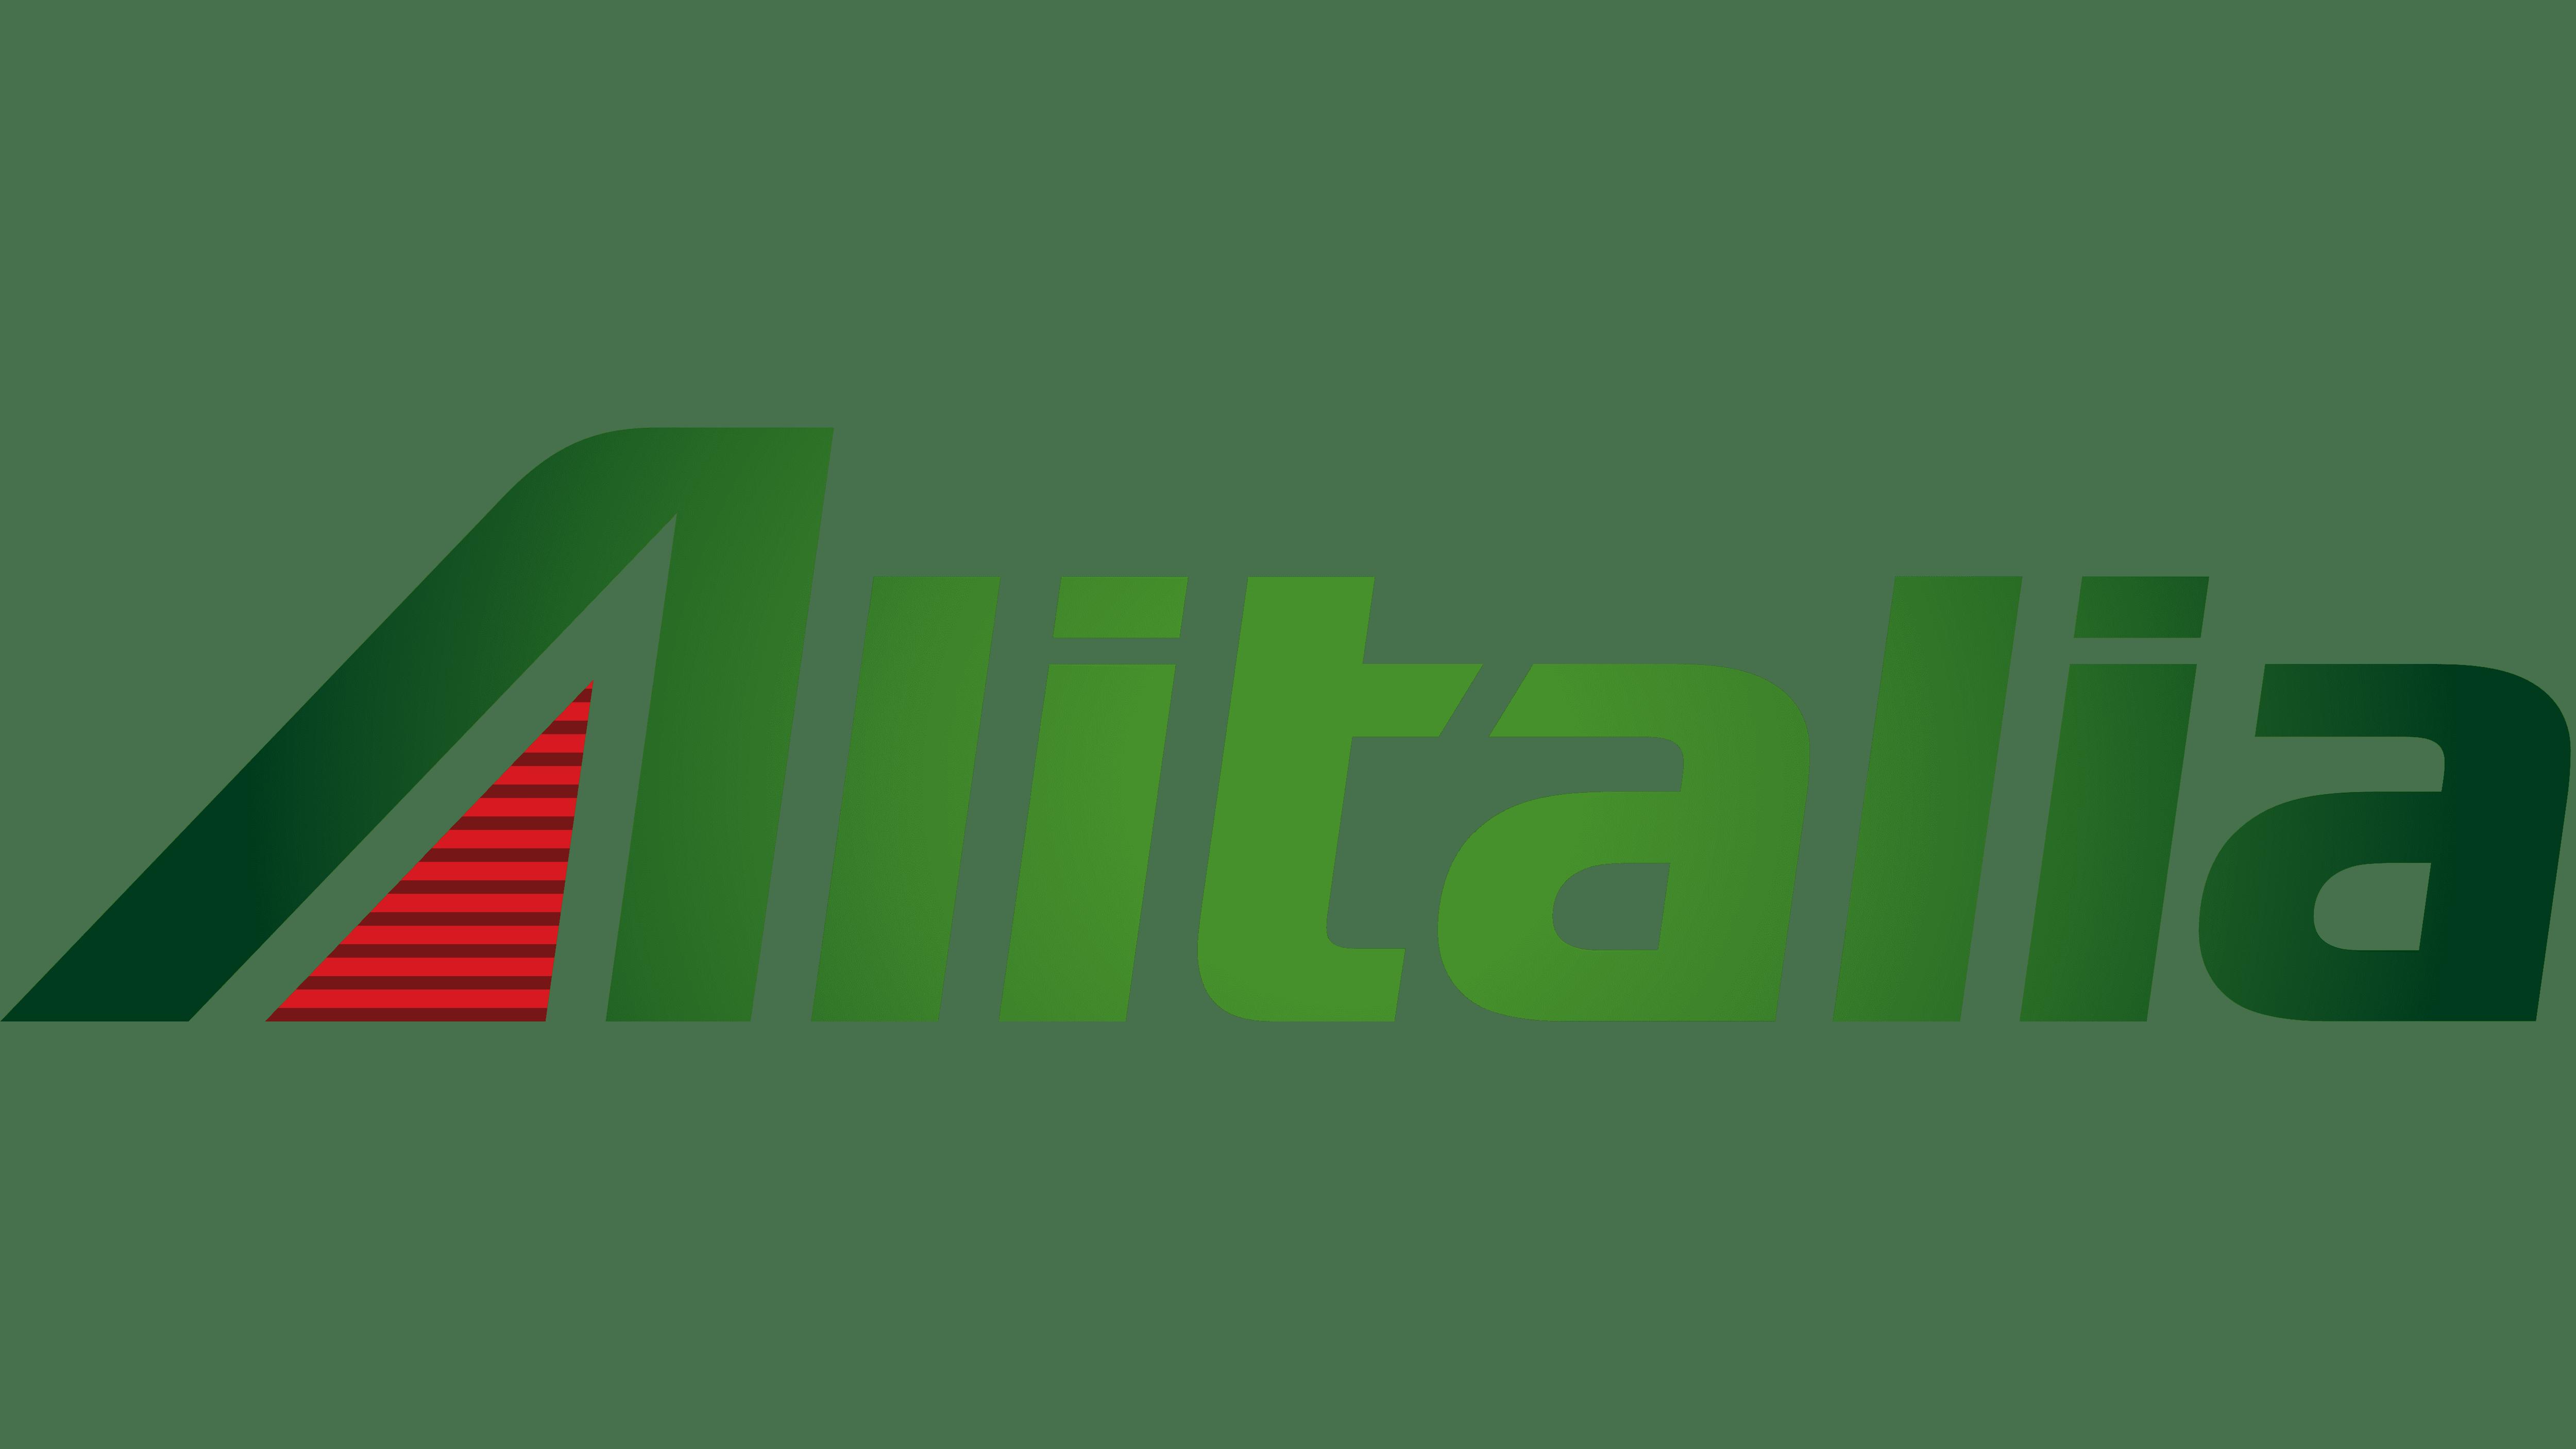 Alitalia Logo Logo